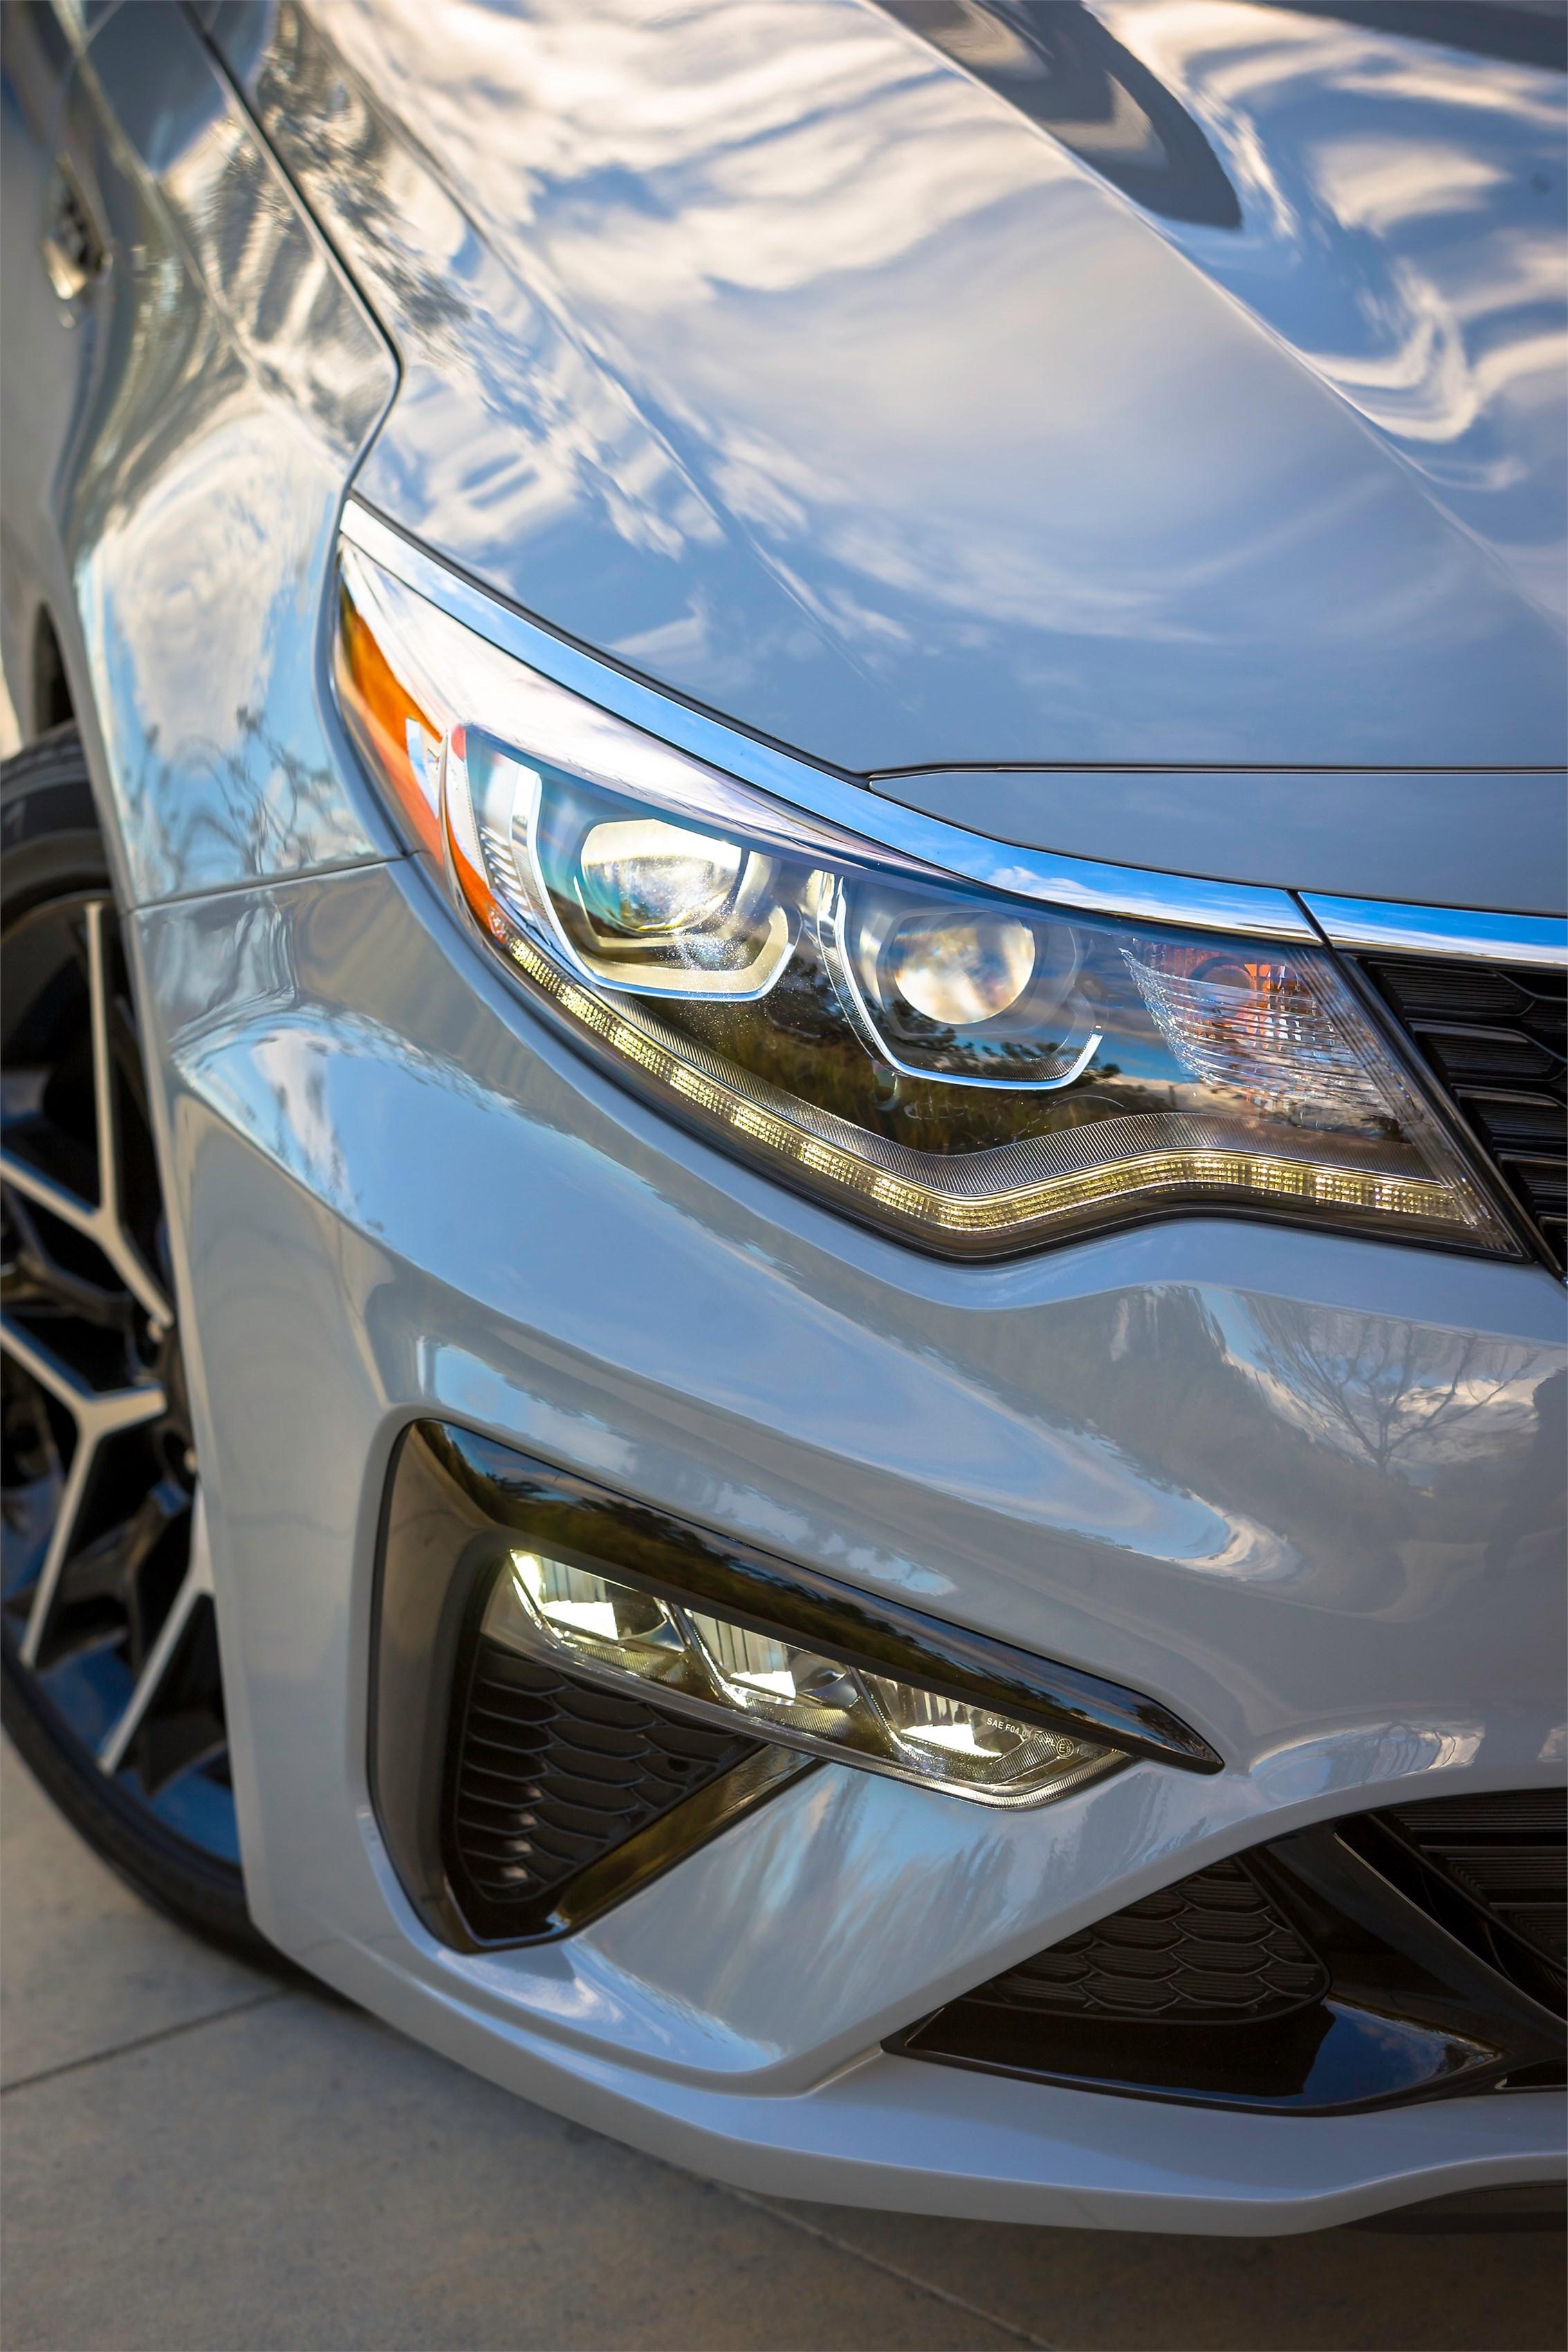 Refreshed 2019 Kia Optima Arrives to the US-market - Korean Car Blog